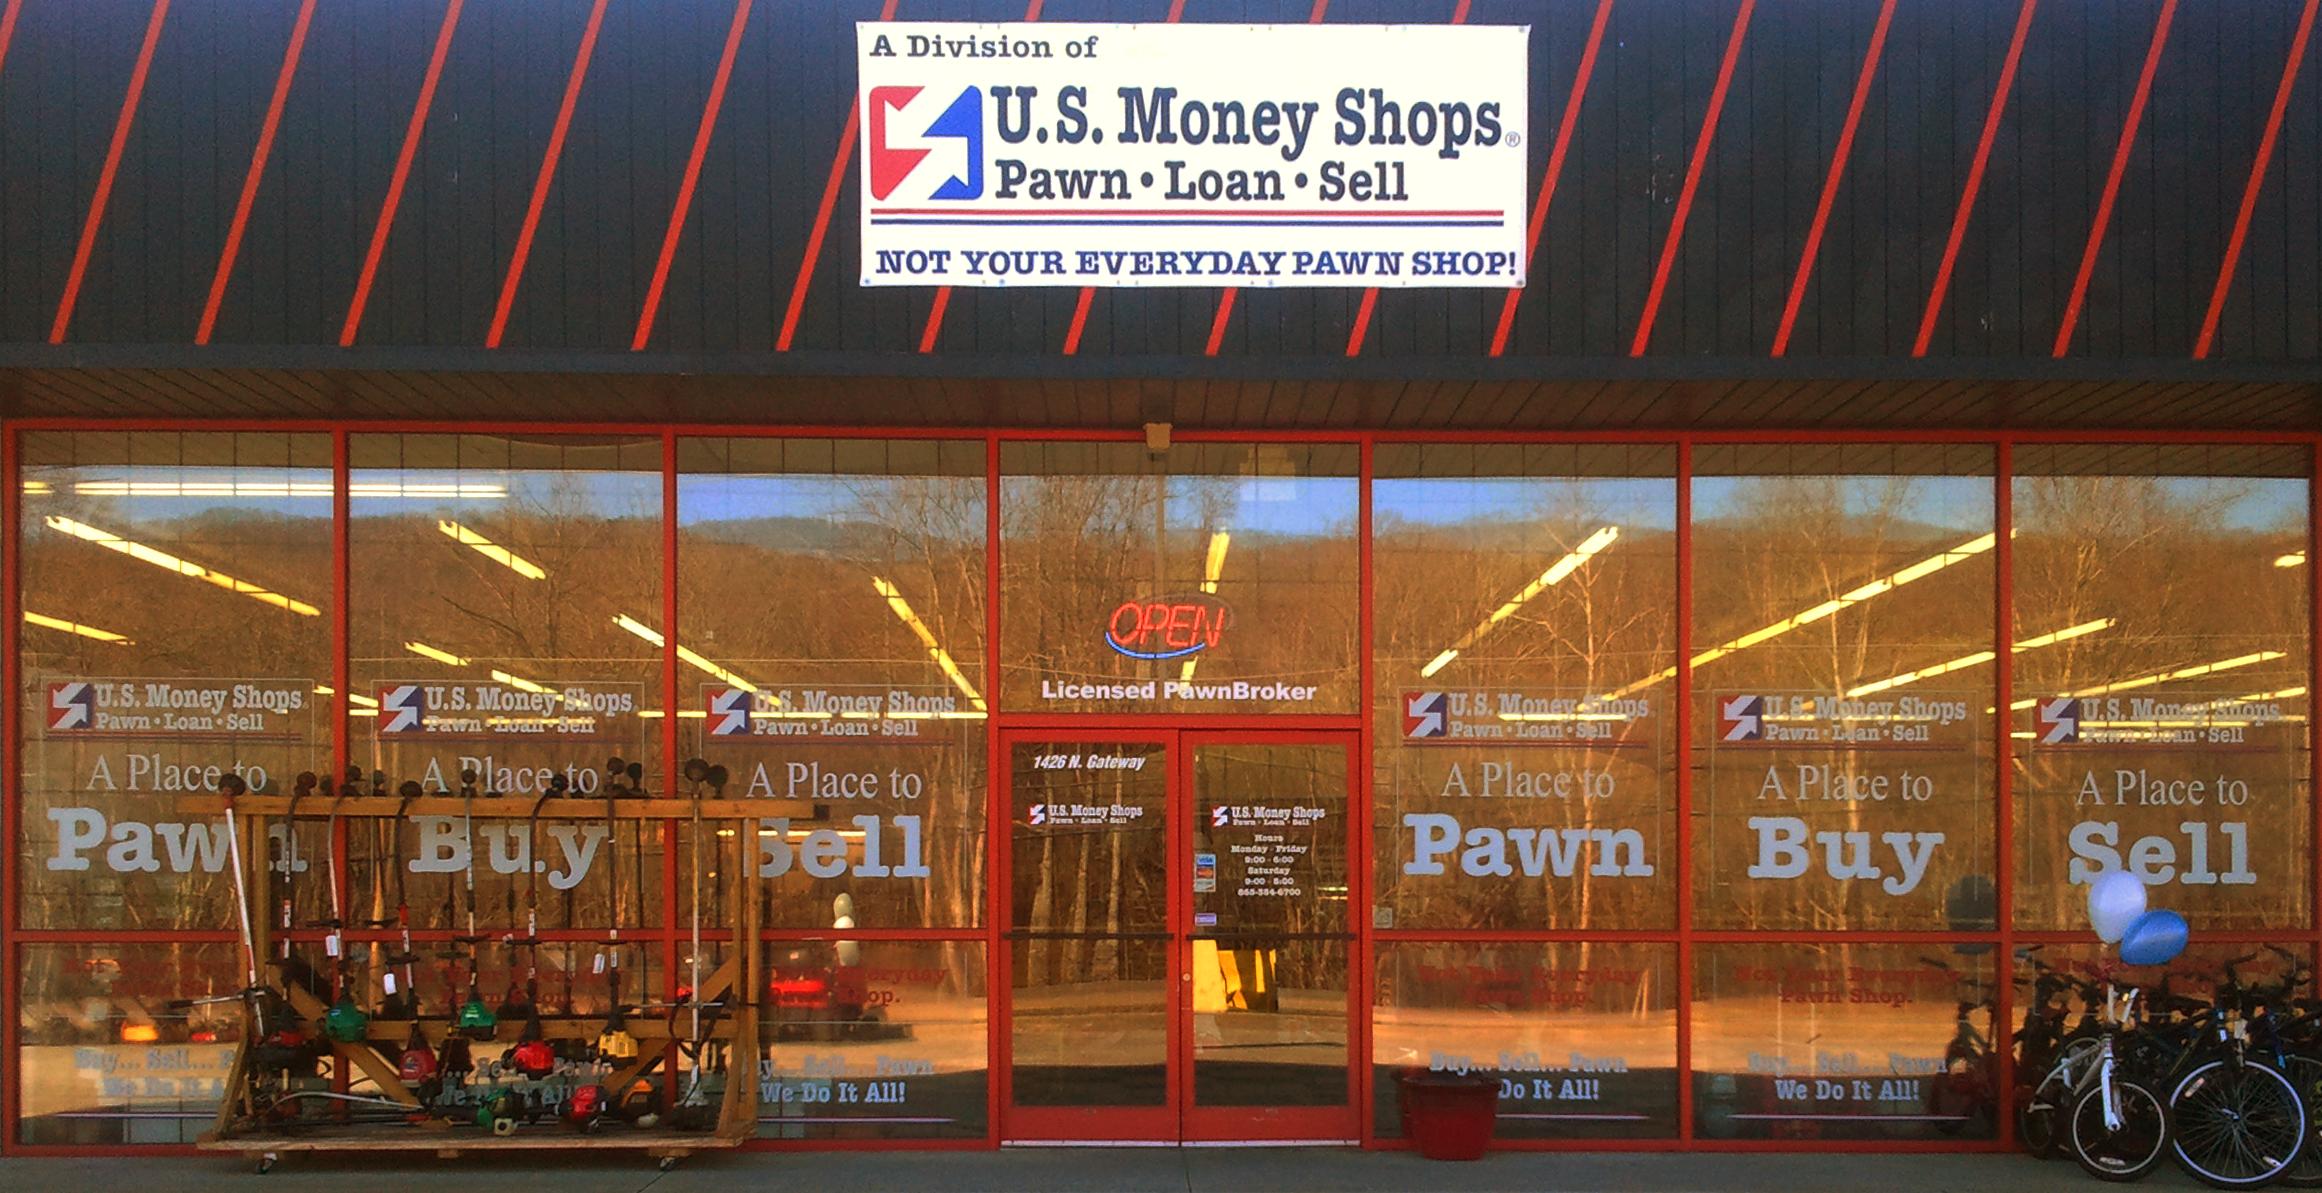 U.S. Money Shops image 1